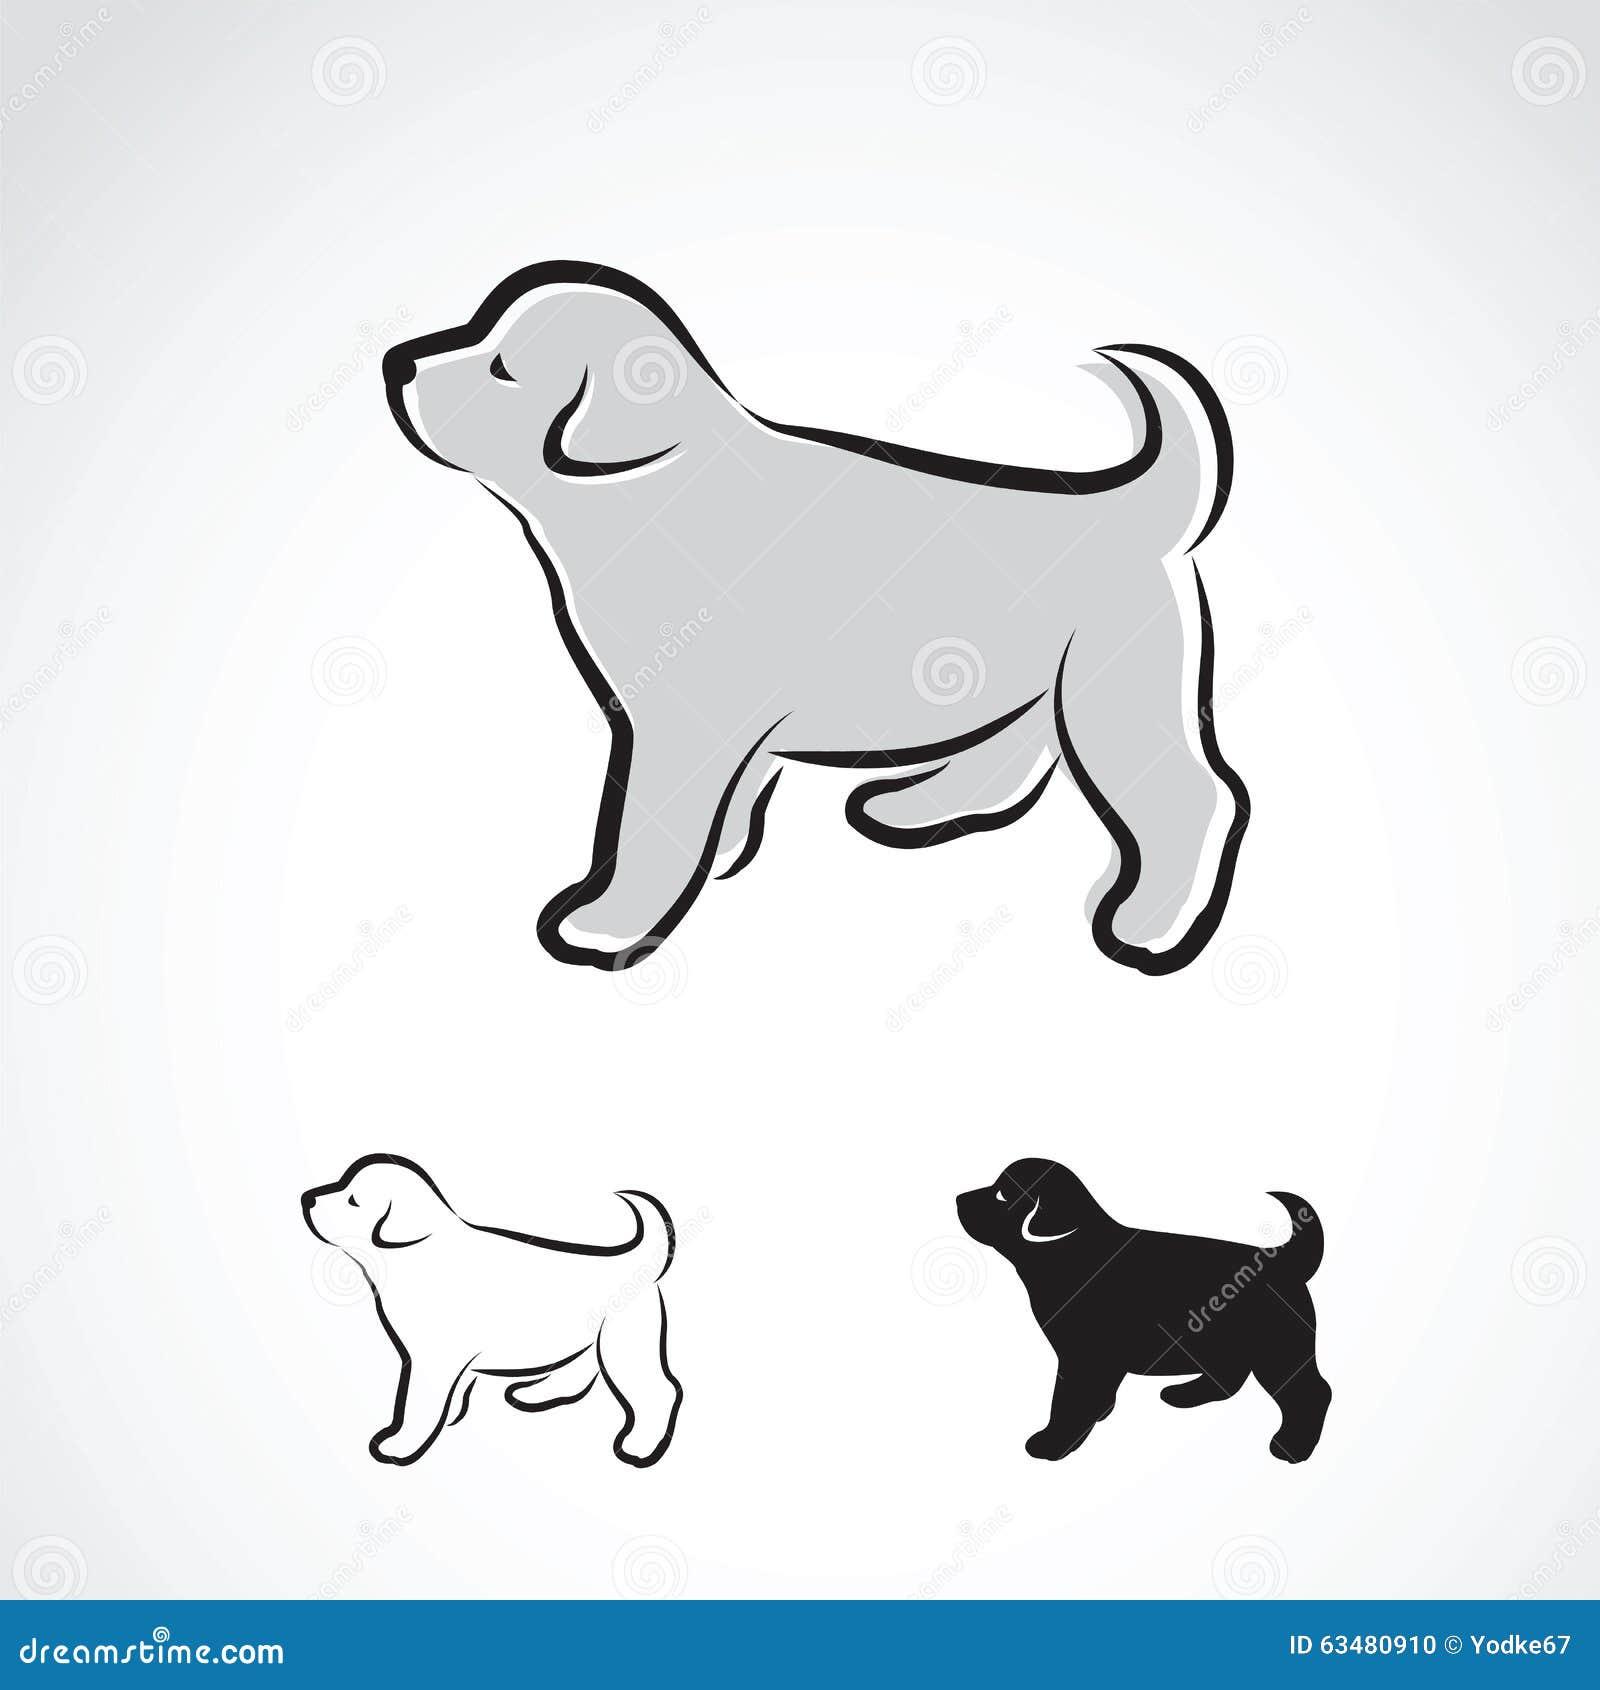 Vector Image Of An Labrador Puppy Illustration 63480910 Megapixl